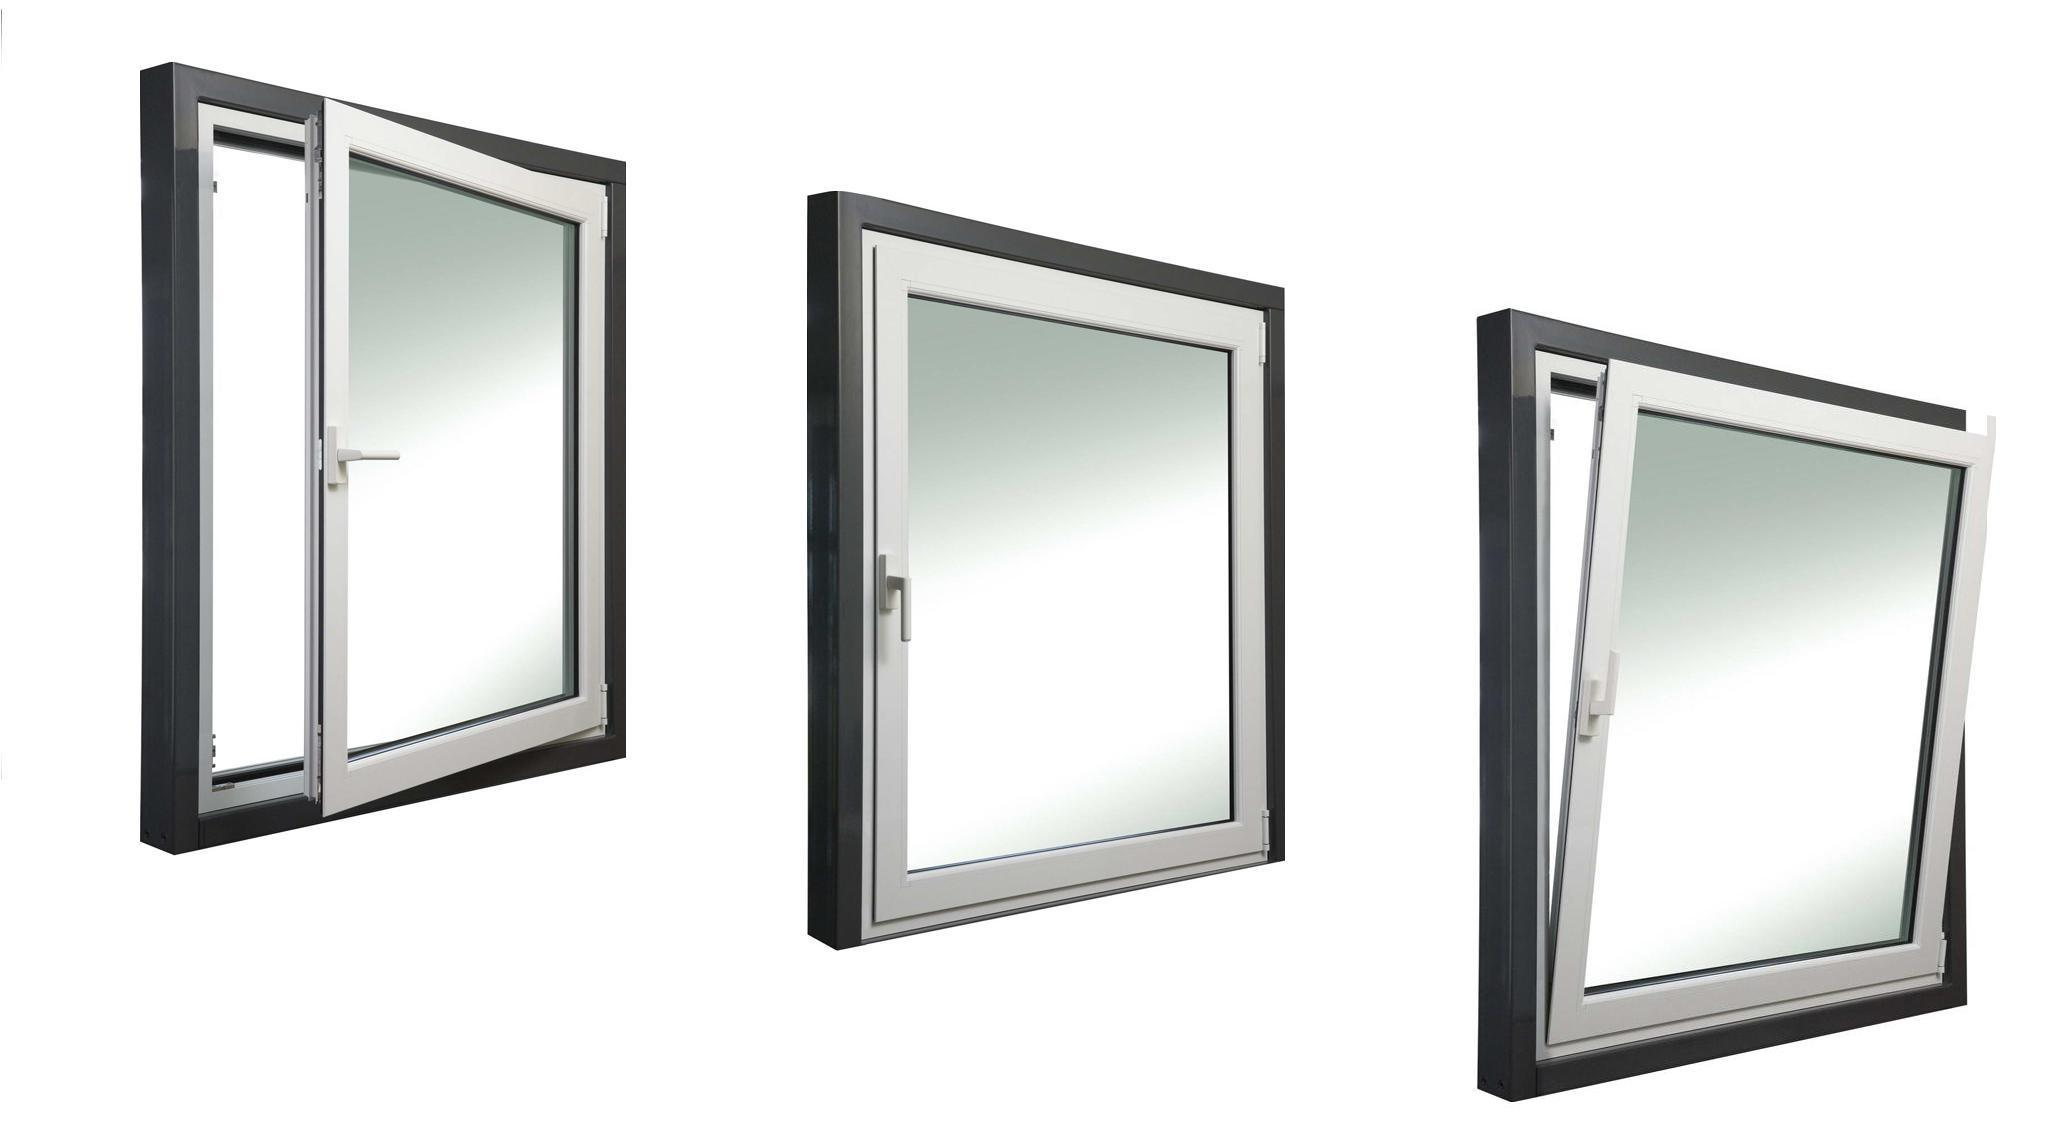 Aluminum Vertical Sliding Window Design American Style Double Hung Window